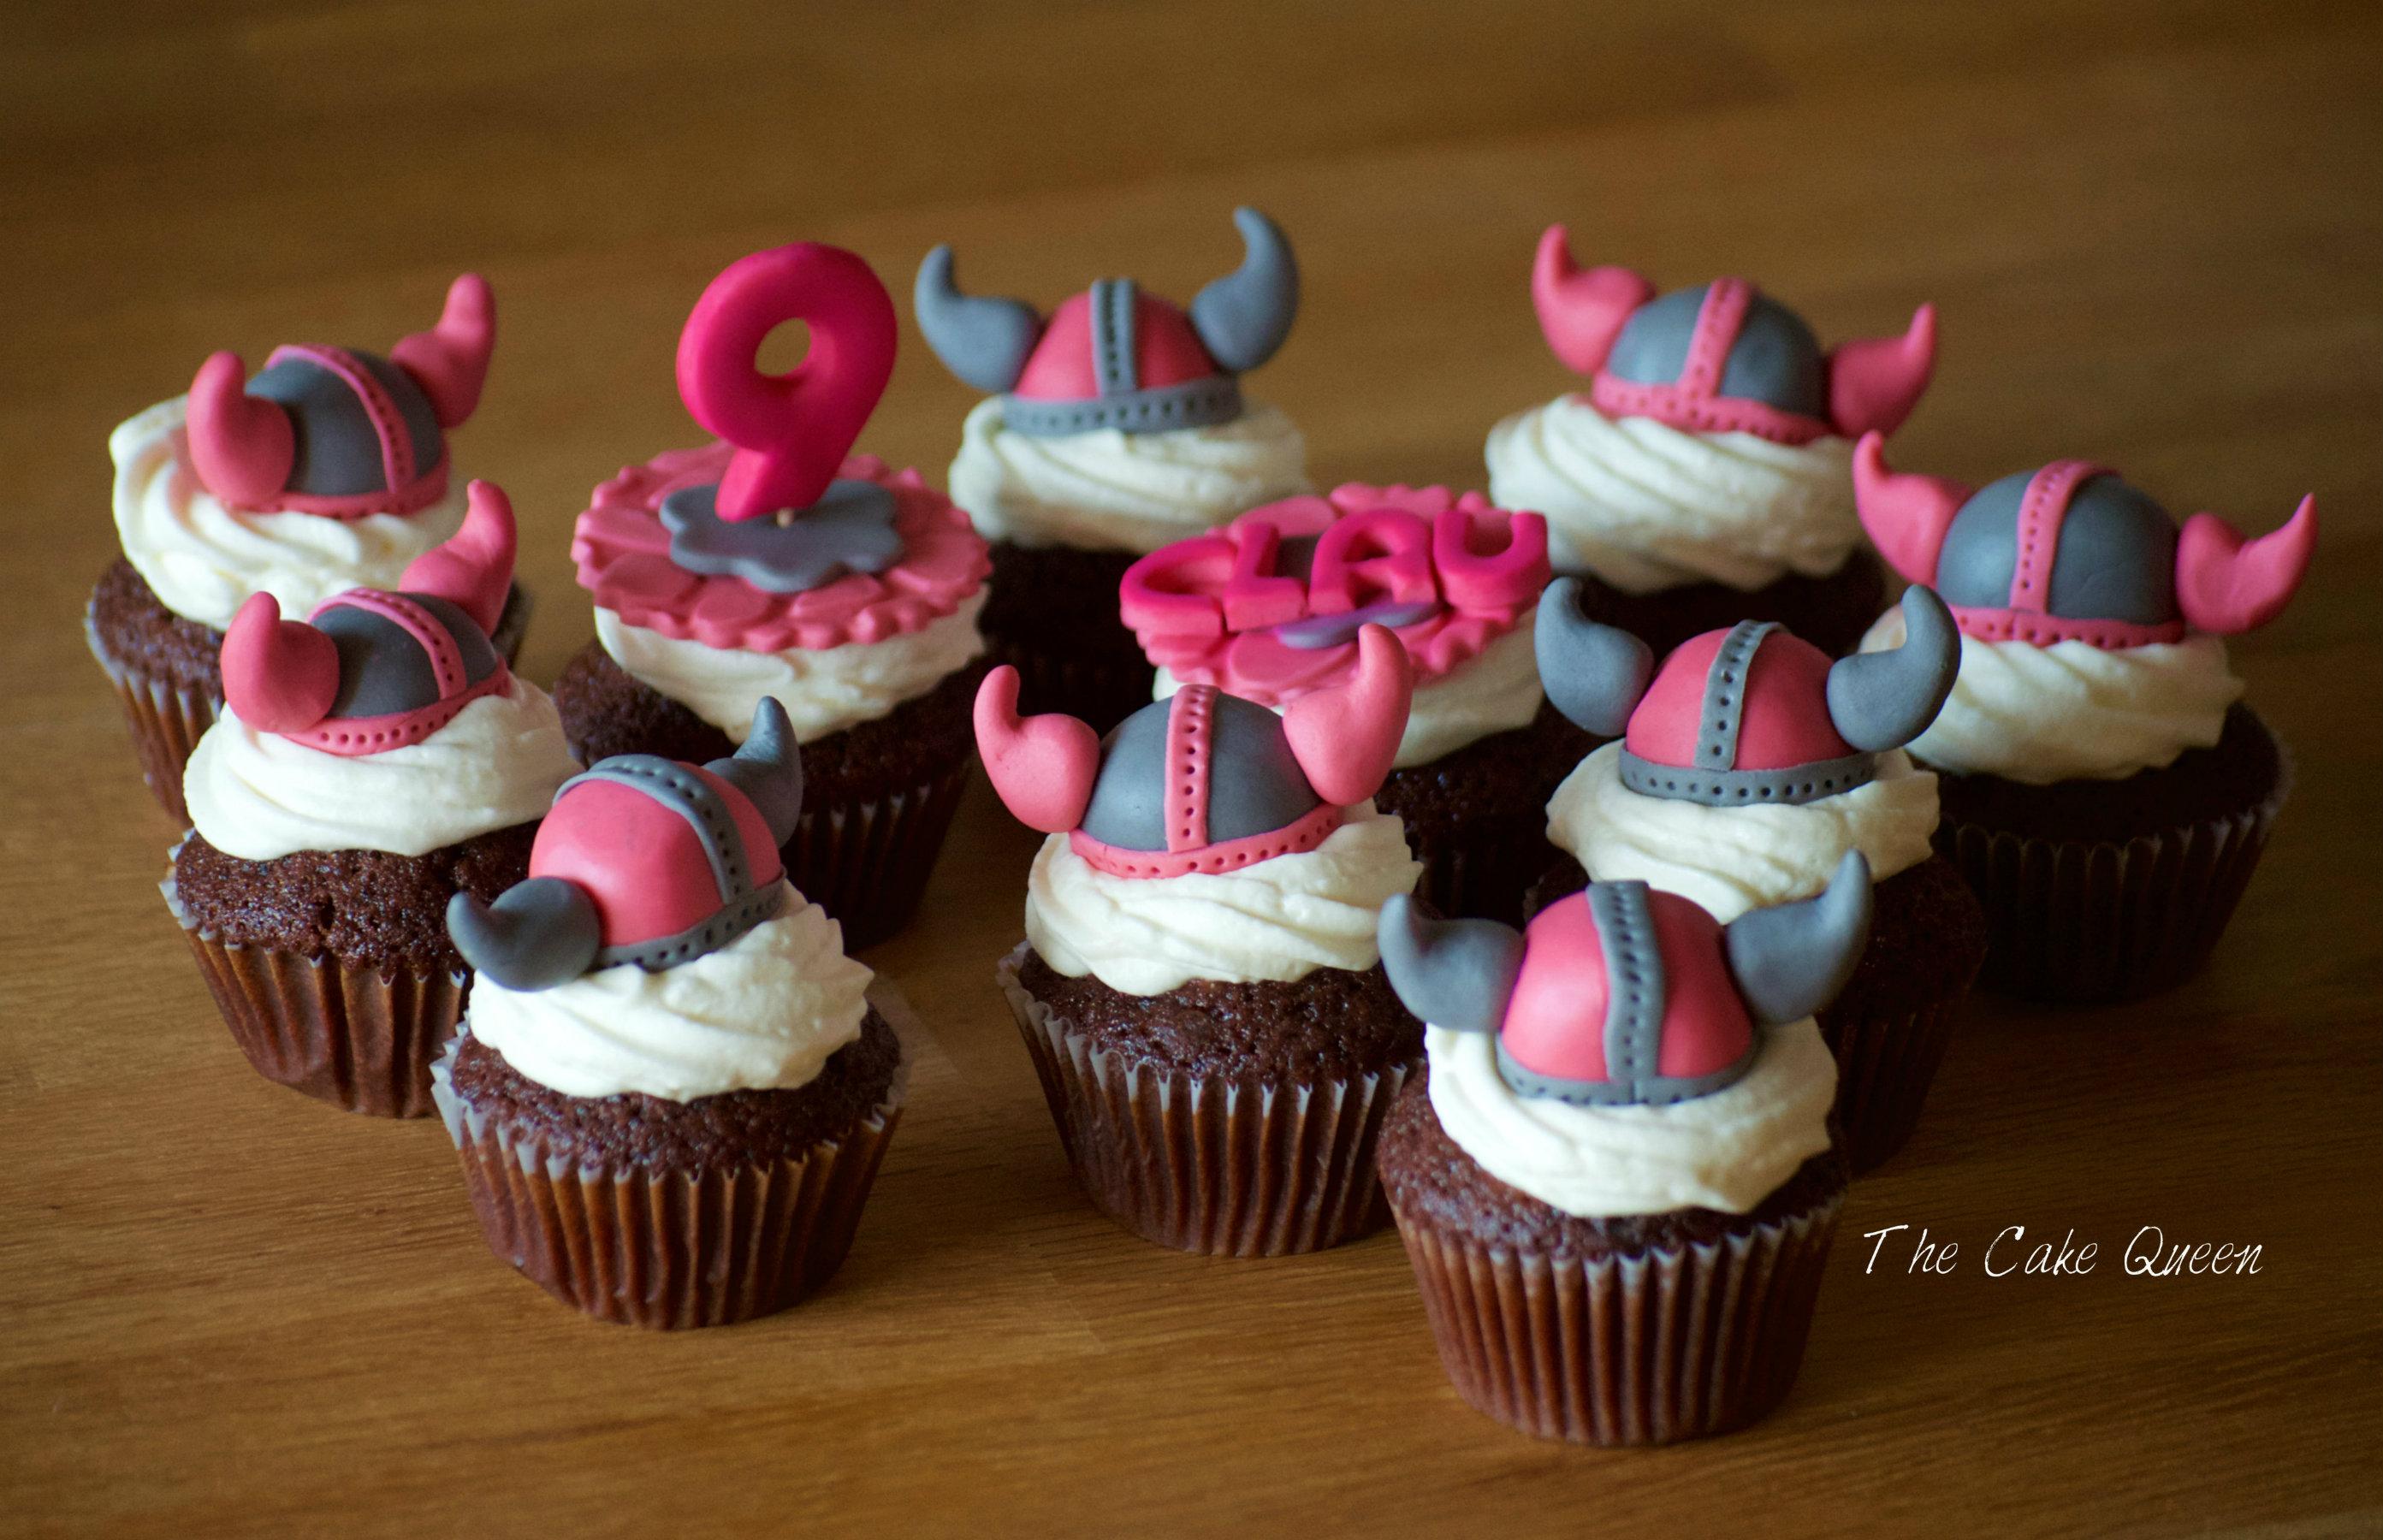 Mini Cupcakes de chocolate con crema fresca